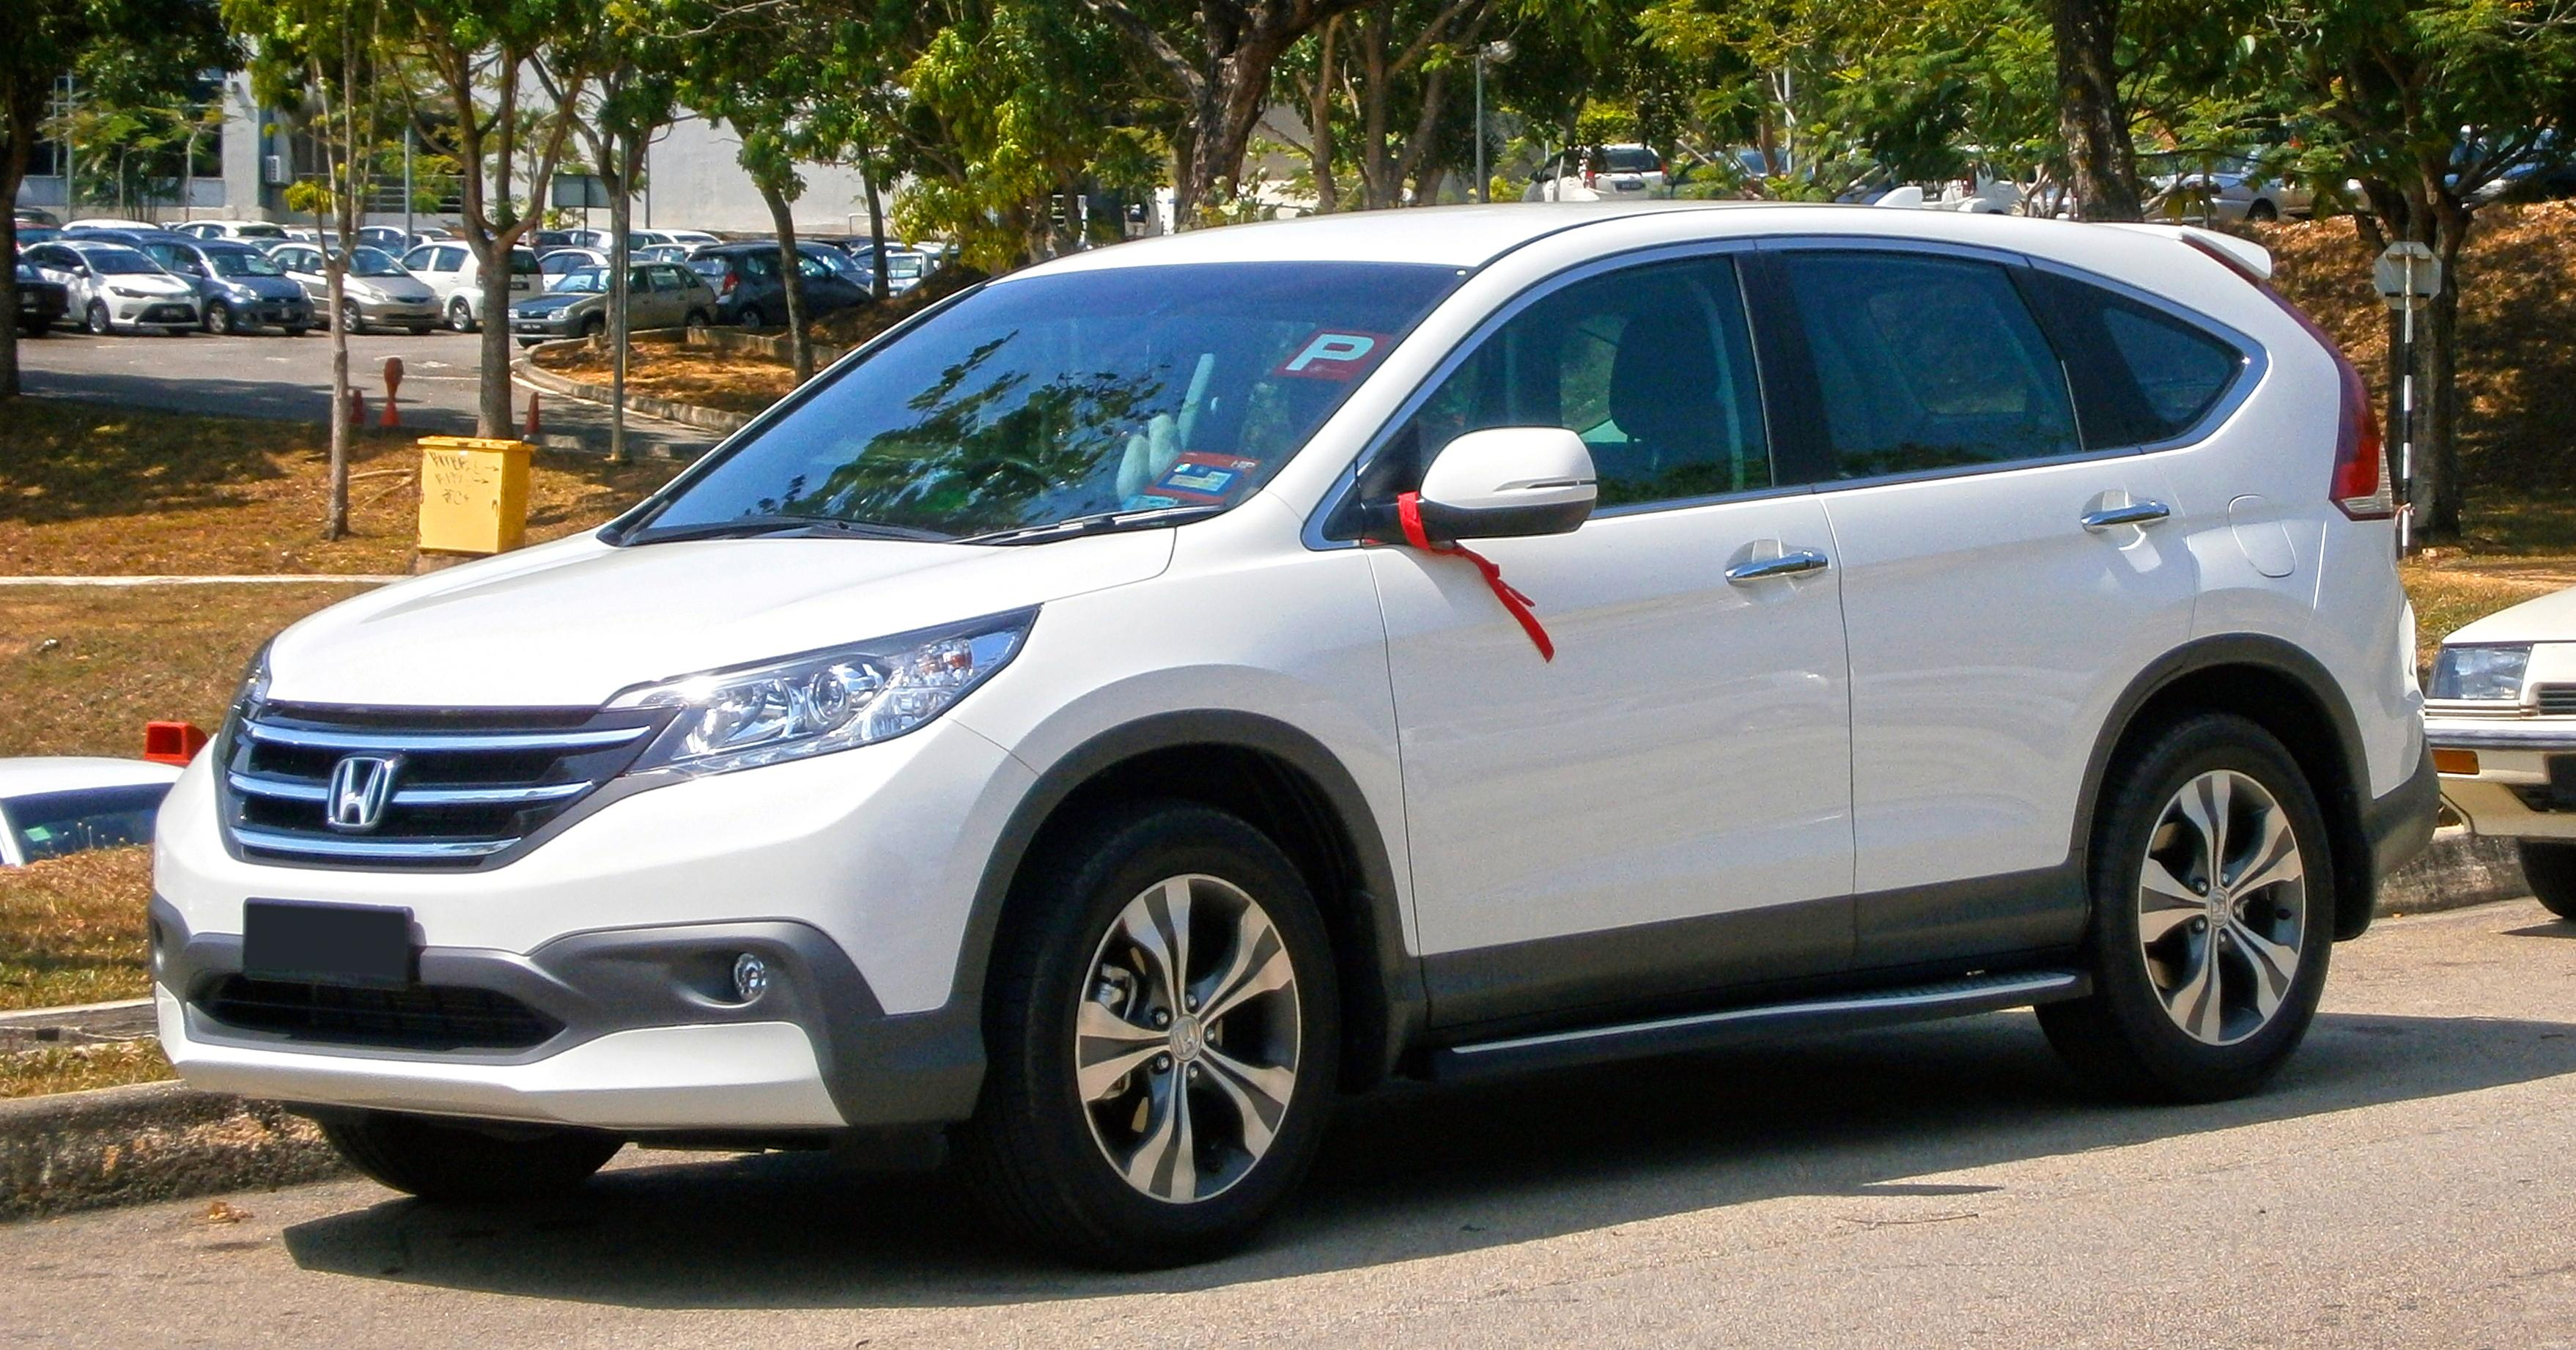 2014 honda crv seat covers for Honda crv 2014